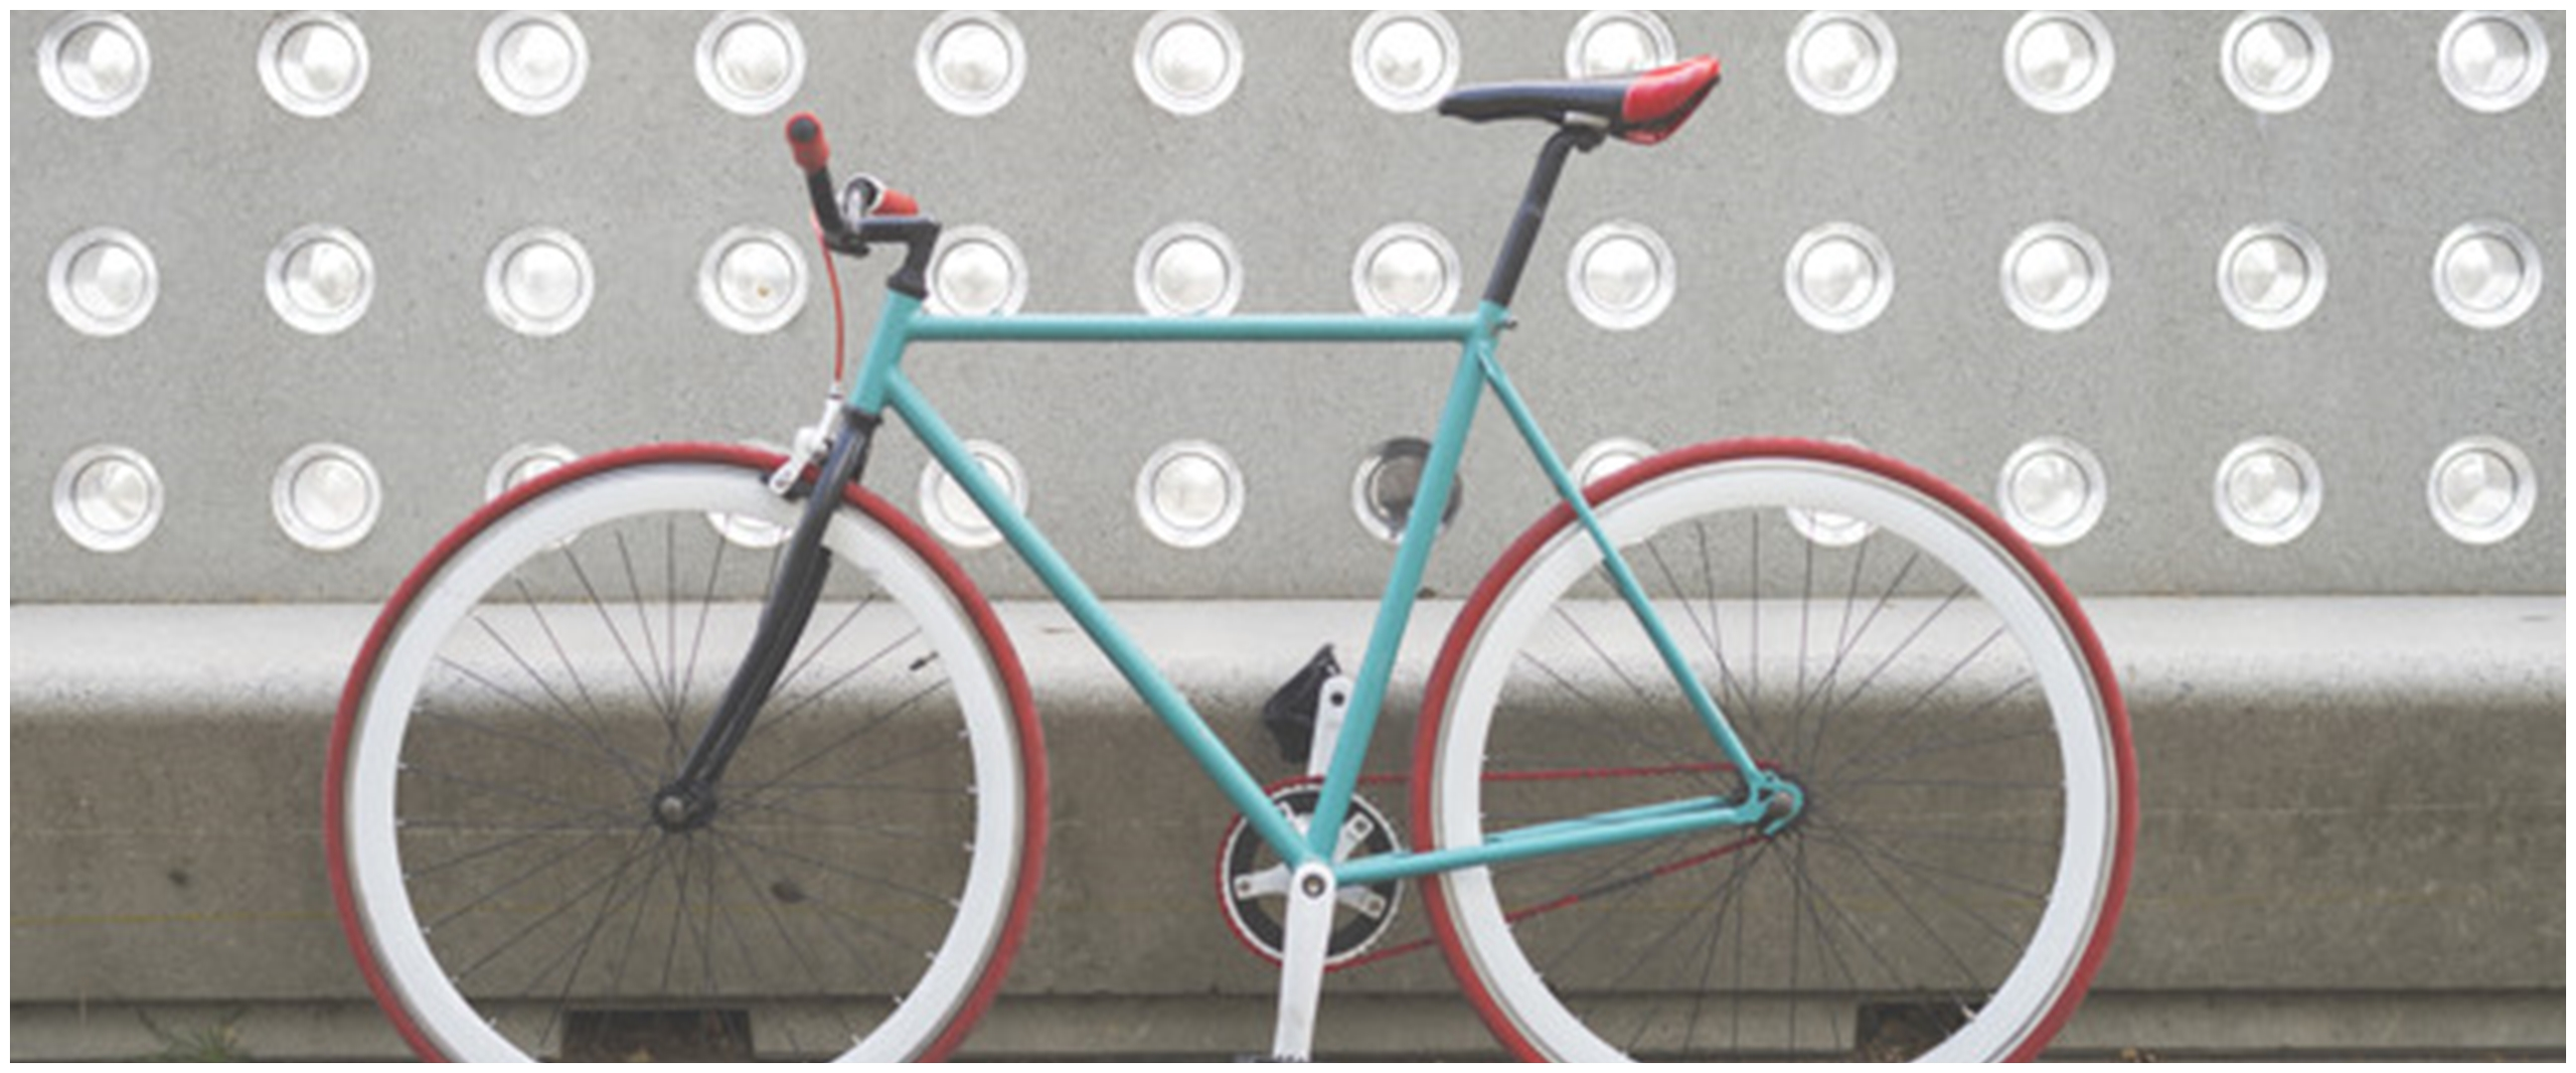 Harga sepeda fixie United Soloist 77 dan spesifikasi, stylish abis